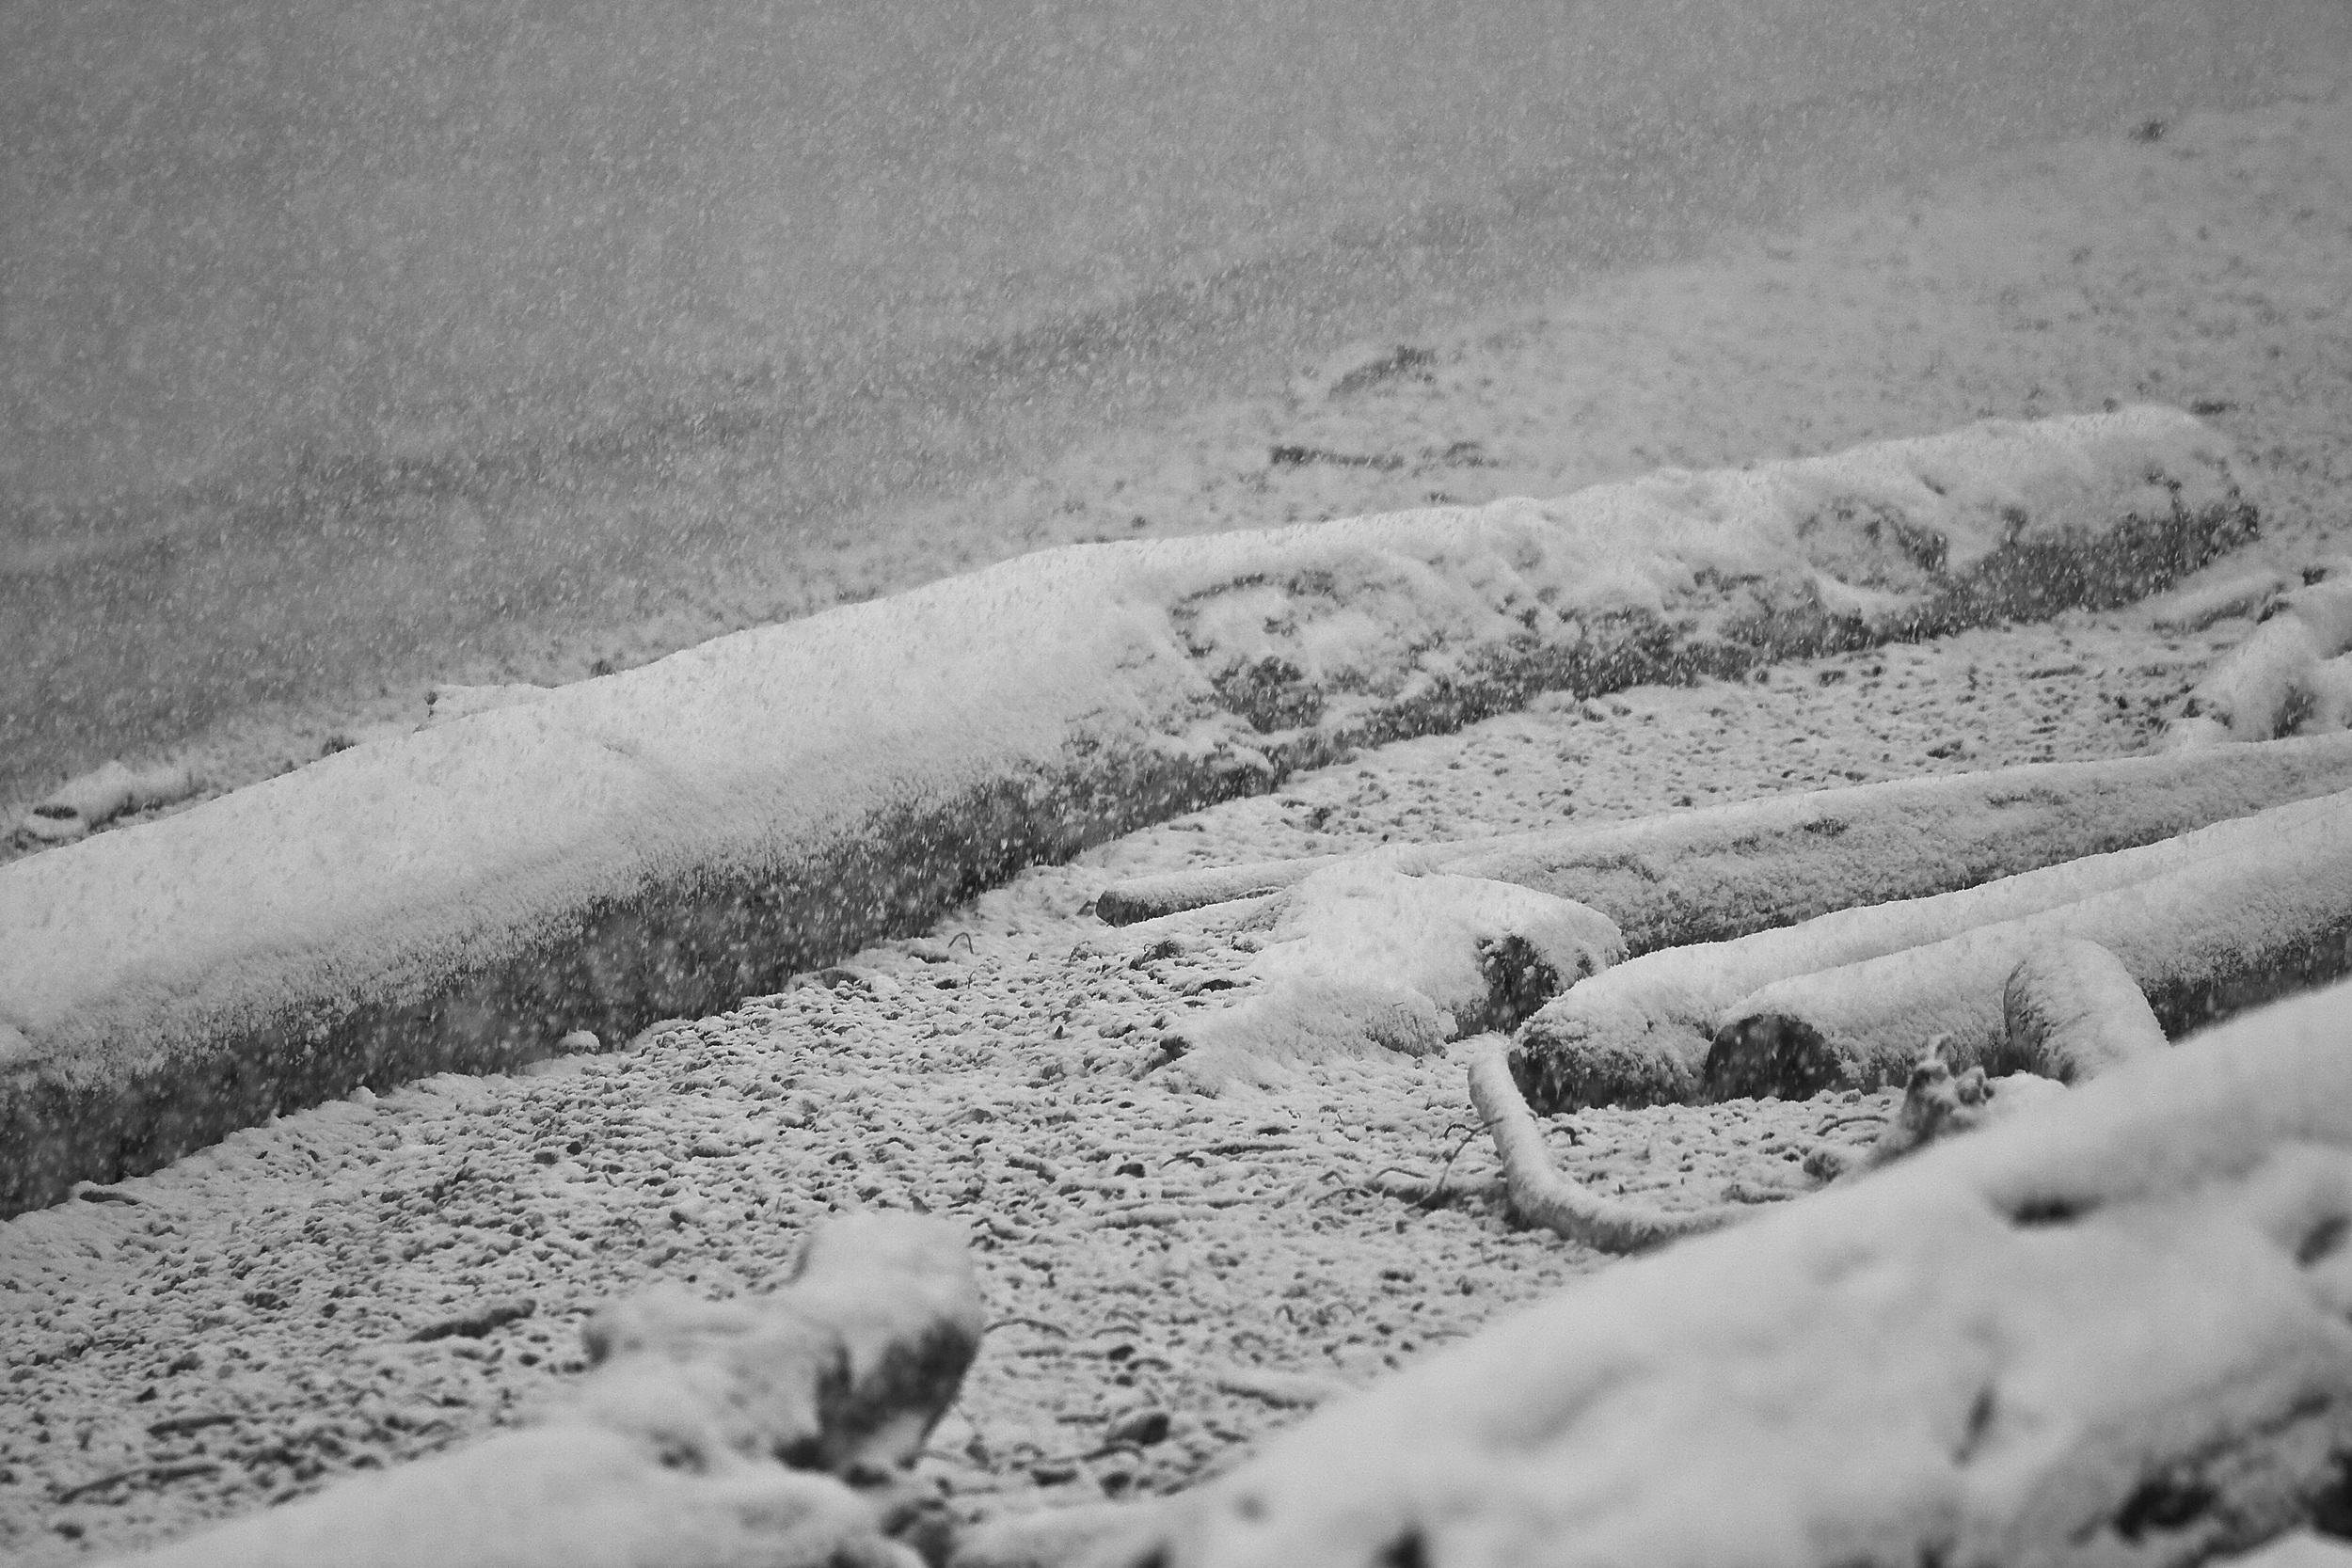 Winter, Salish Sea, B.C.